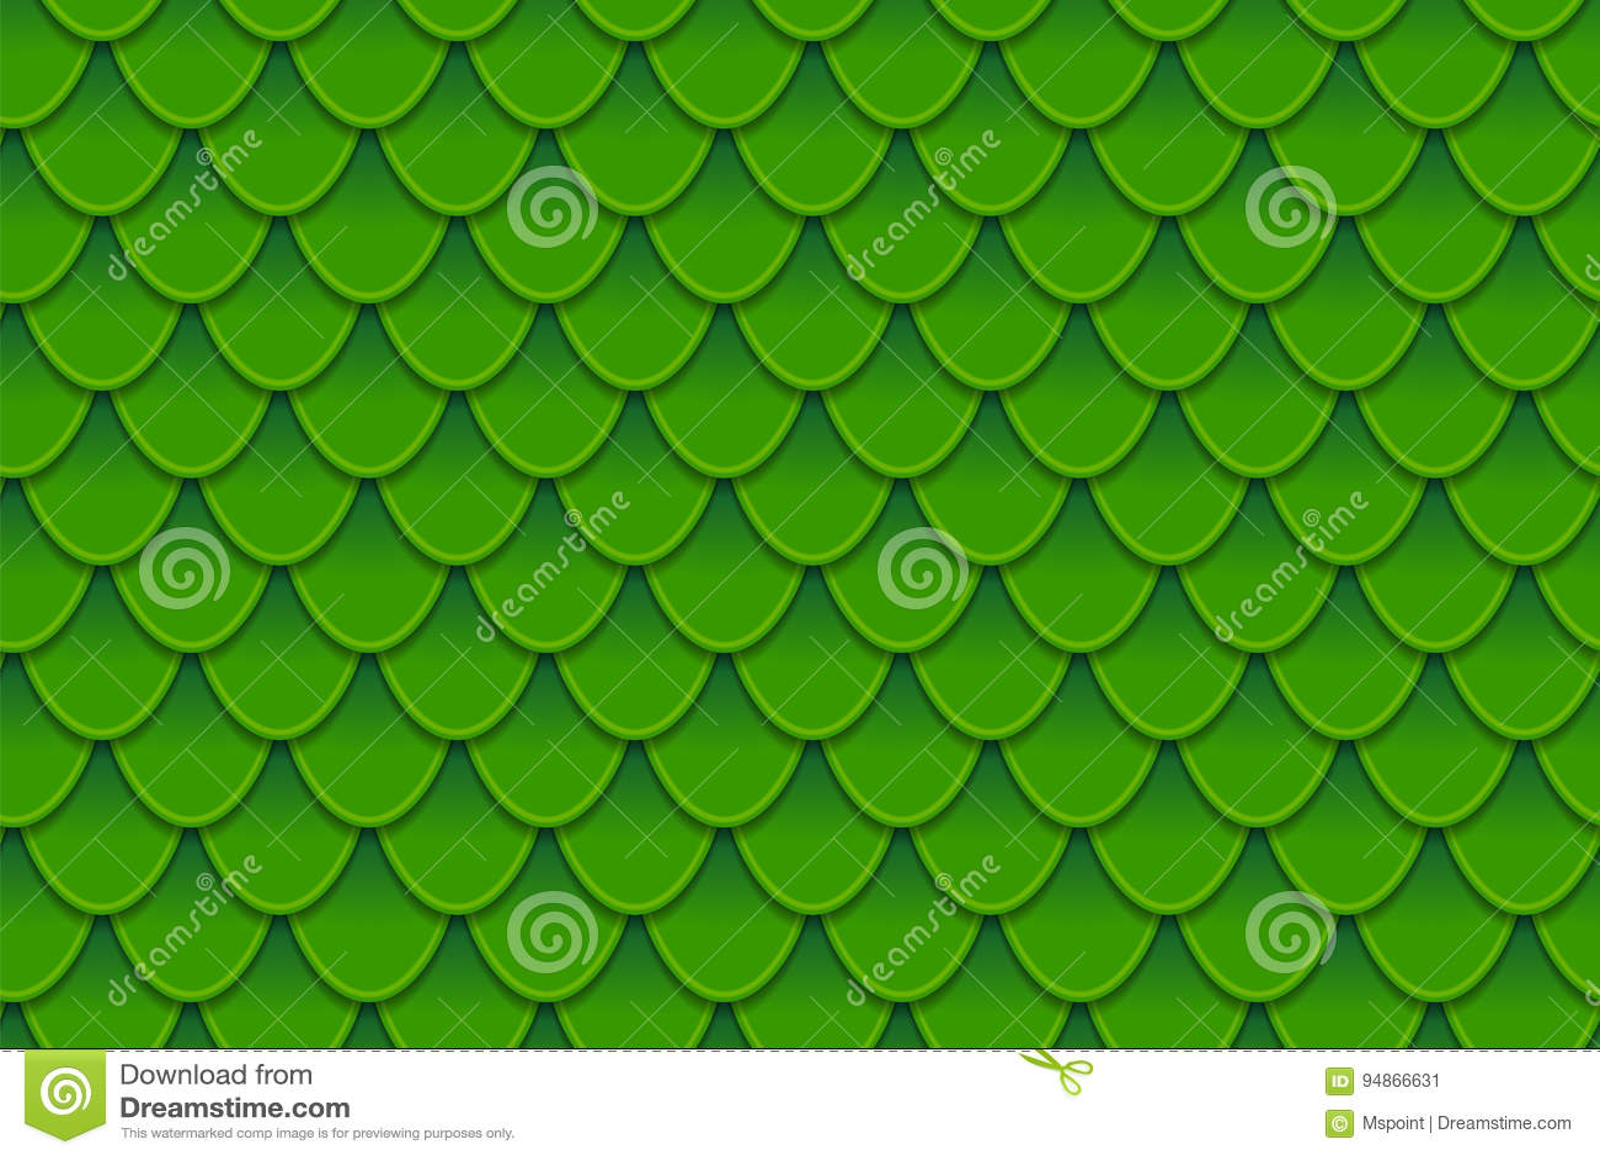 Modello senza cuciture delle squame verdi variopinte Squame, pelle del drago, carpa giapponese, pelle del dinosauro, brufoli, ret